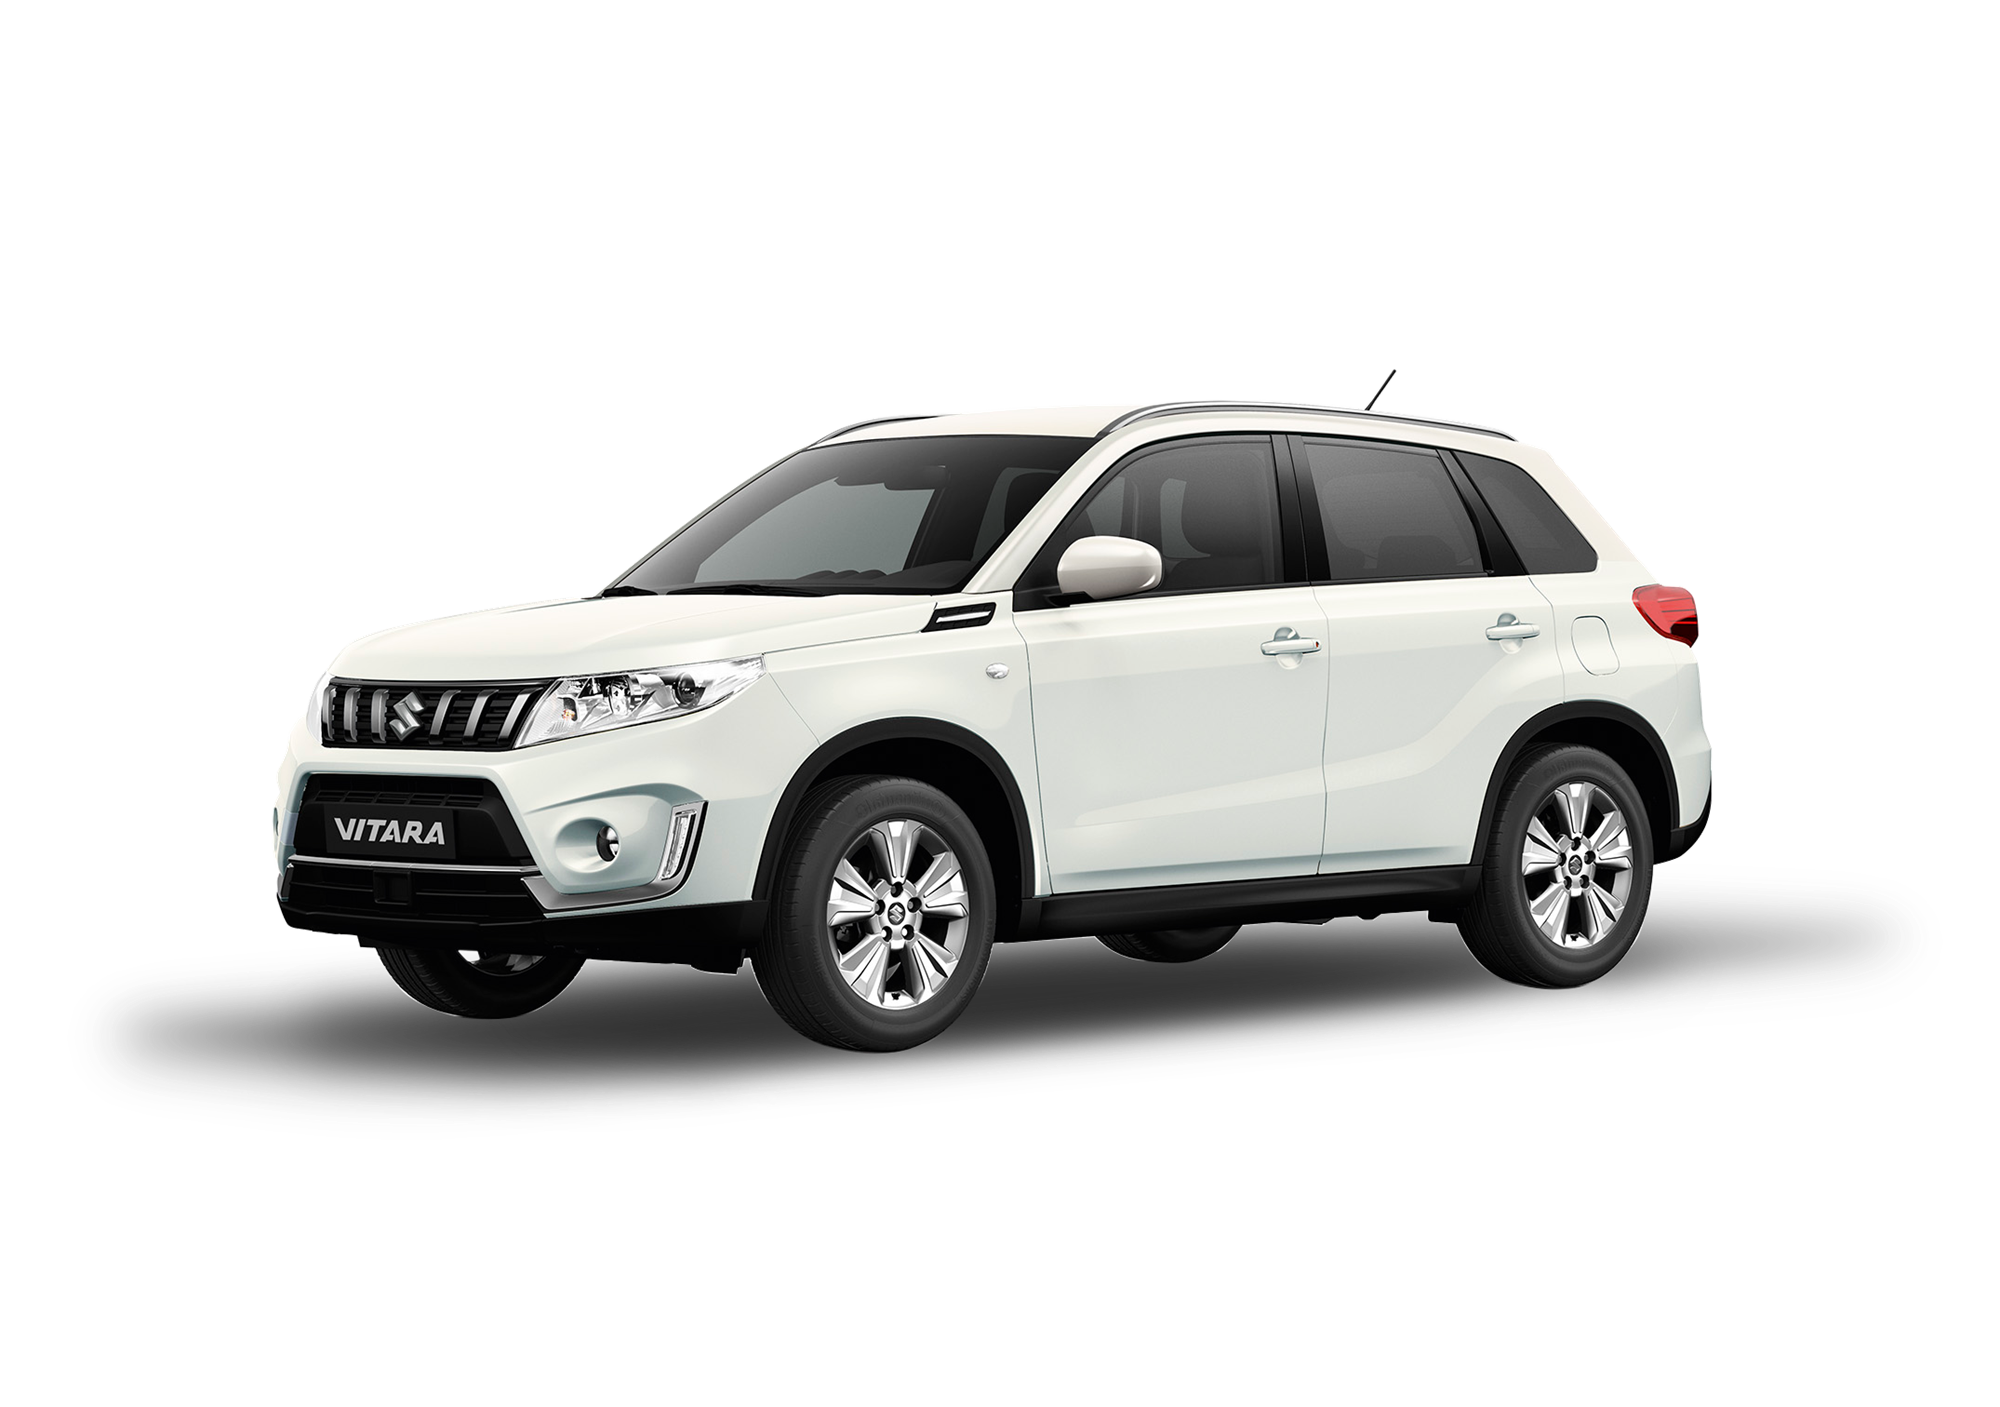 2019 Suzuki Vitara Review, Price, Facelift >> The Suzuki Vitara Sz T Specs Price Suzuki Cars Uk